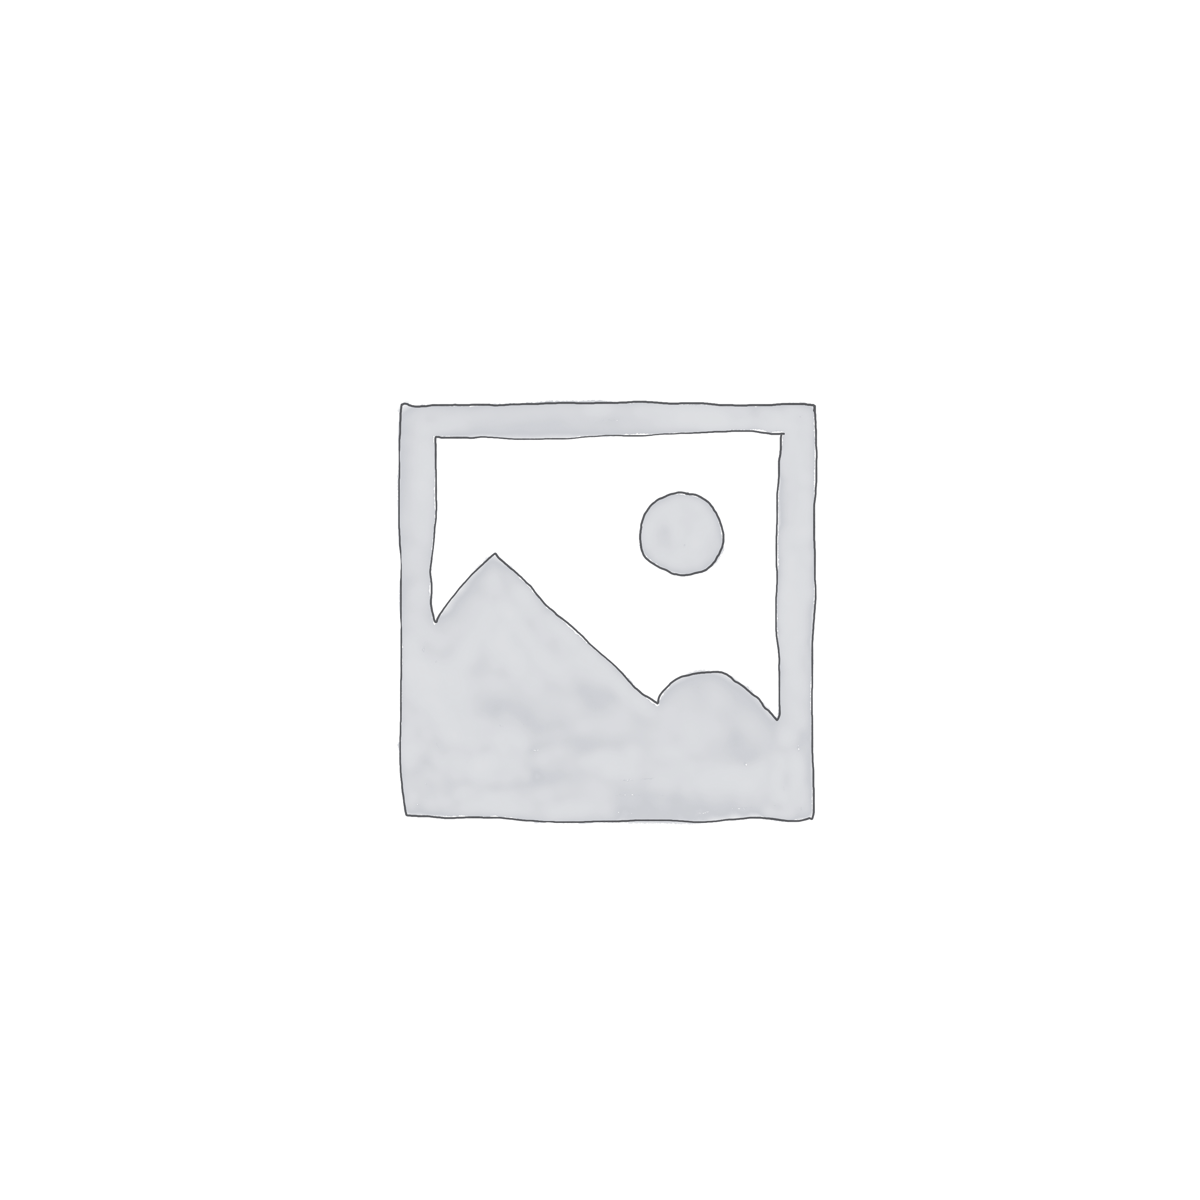 Box Springs / Adjustable Bases